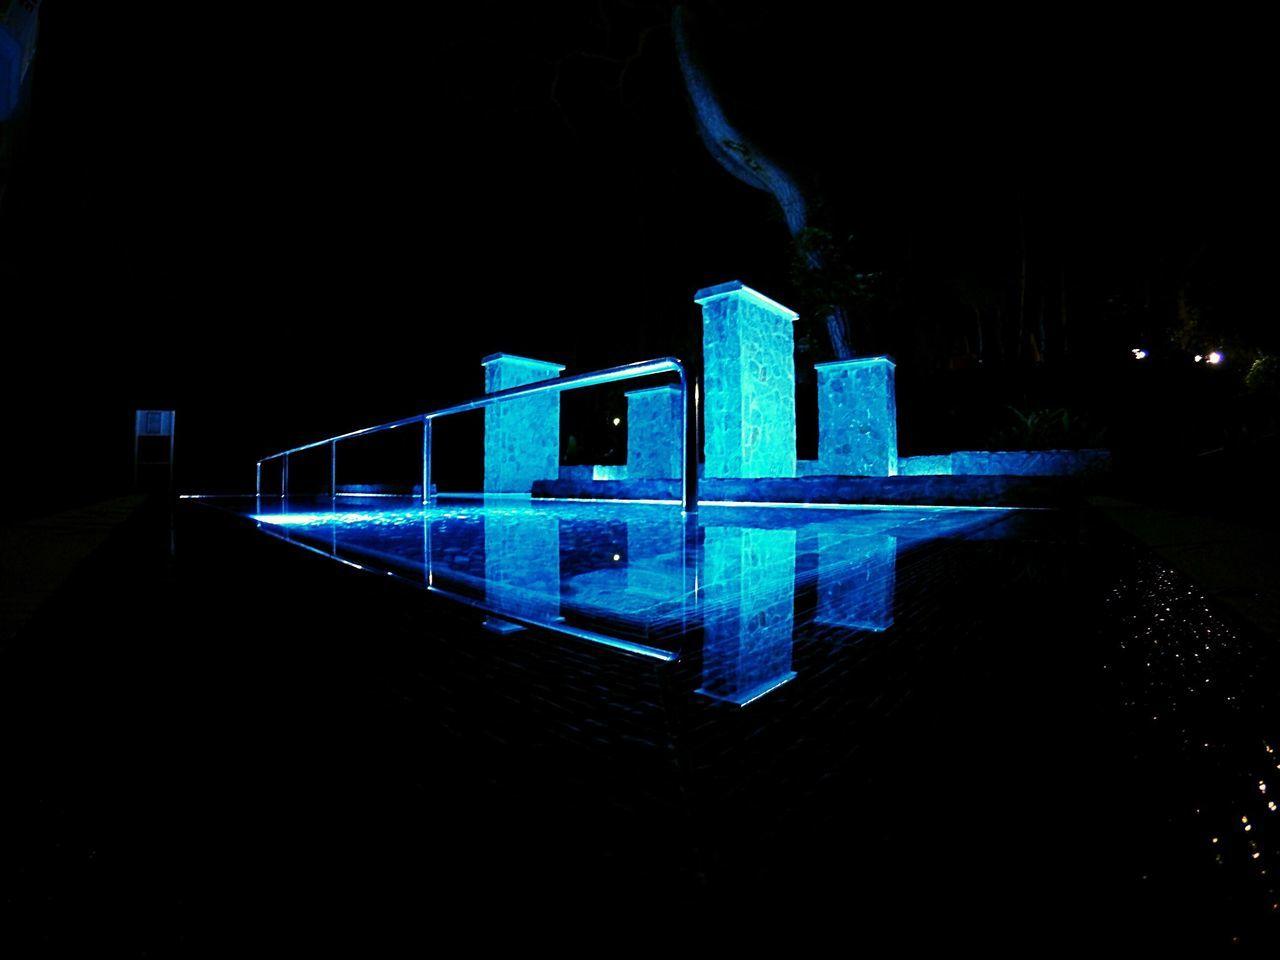 night, illuminated, blue, reflection, no people, outdoors, architecture, sky